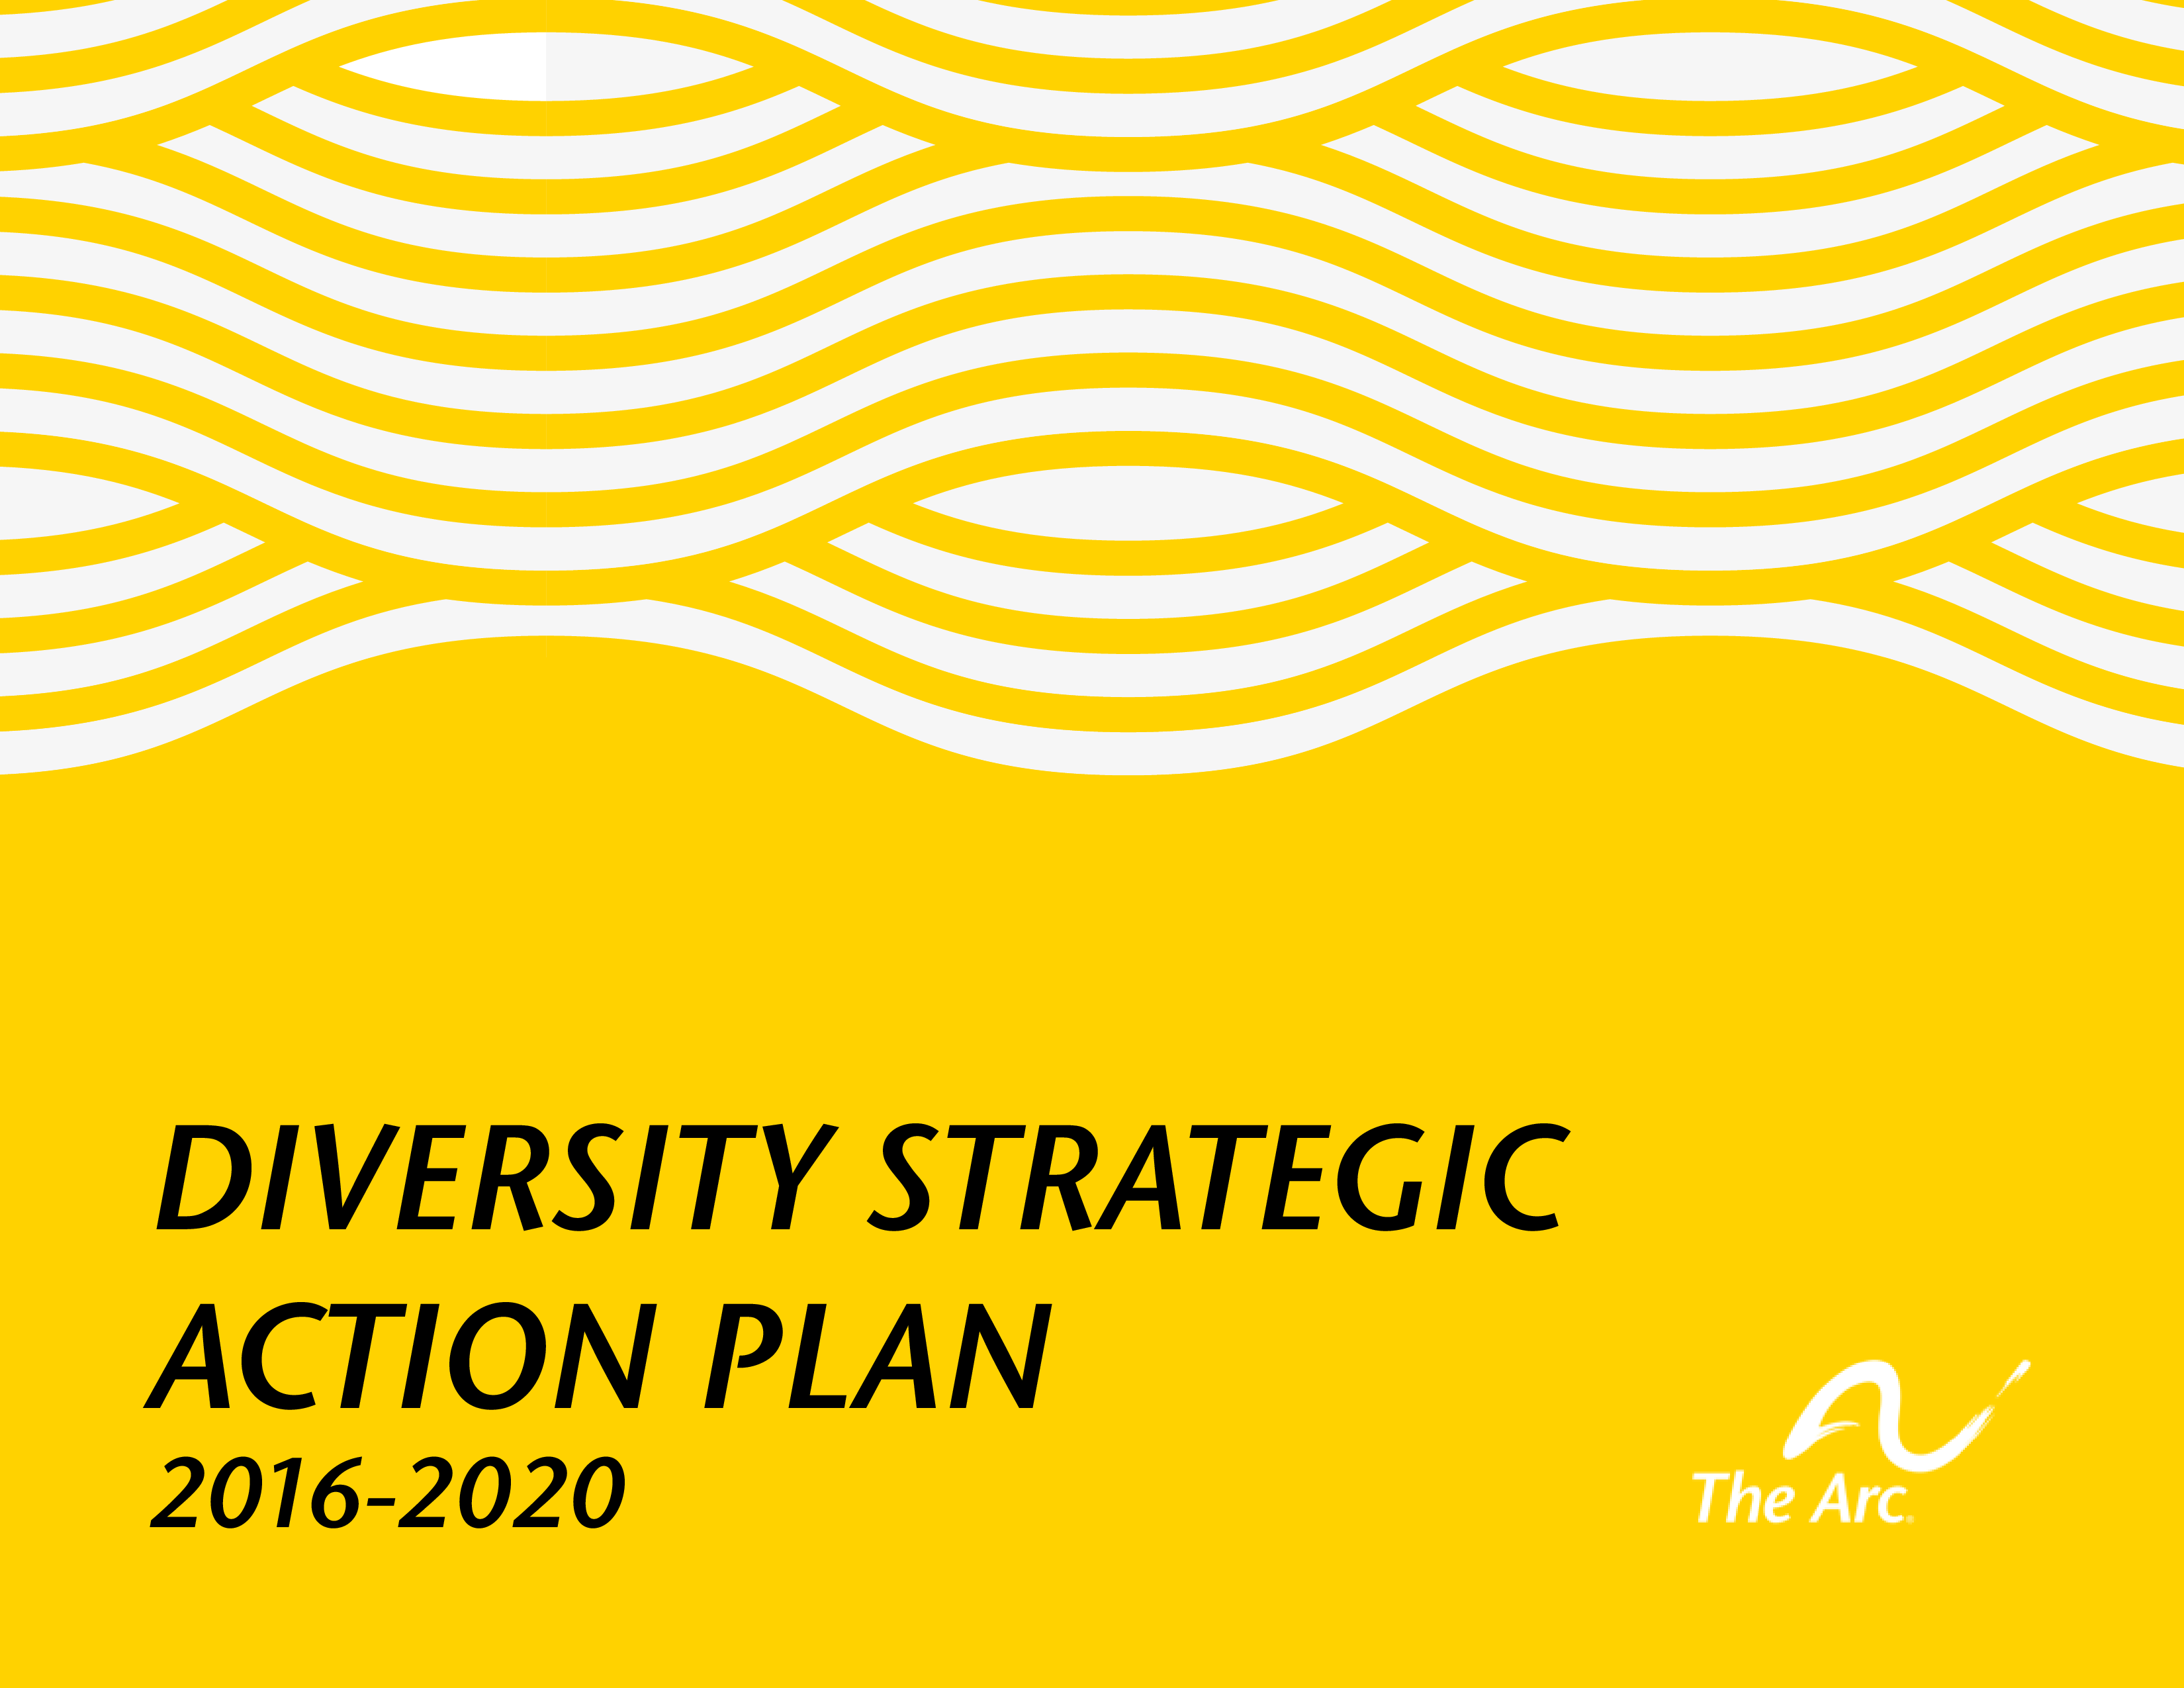 Free Diversity Strategic Action Plan | Templates at ...